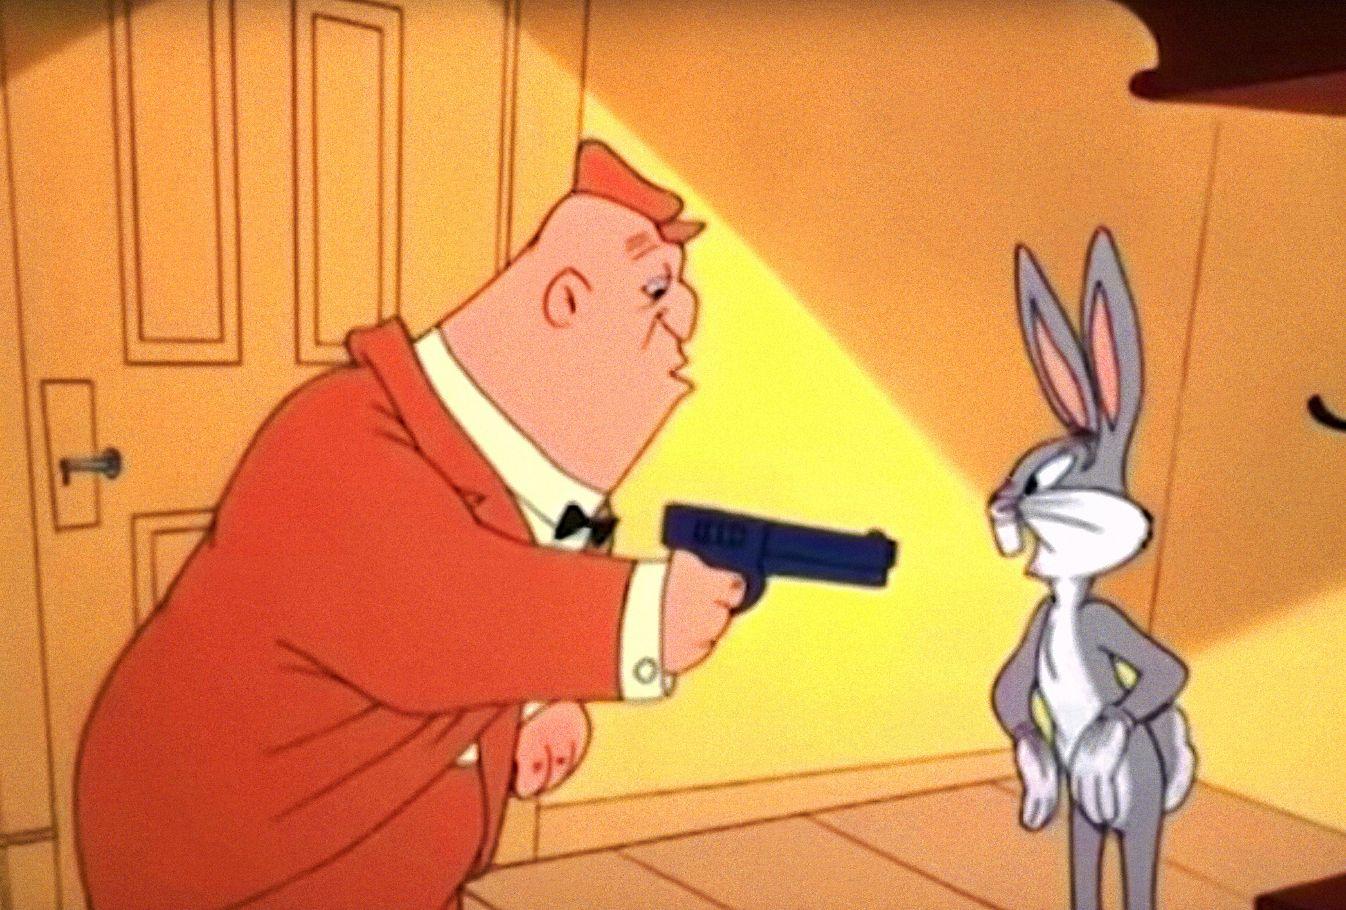 Tupac - Hail Mary | Bugs Bunny Mashup | Atomlabor Blog | Dein Lifestyle Blog aus Wuppertal